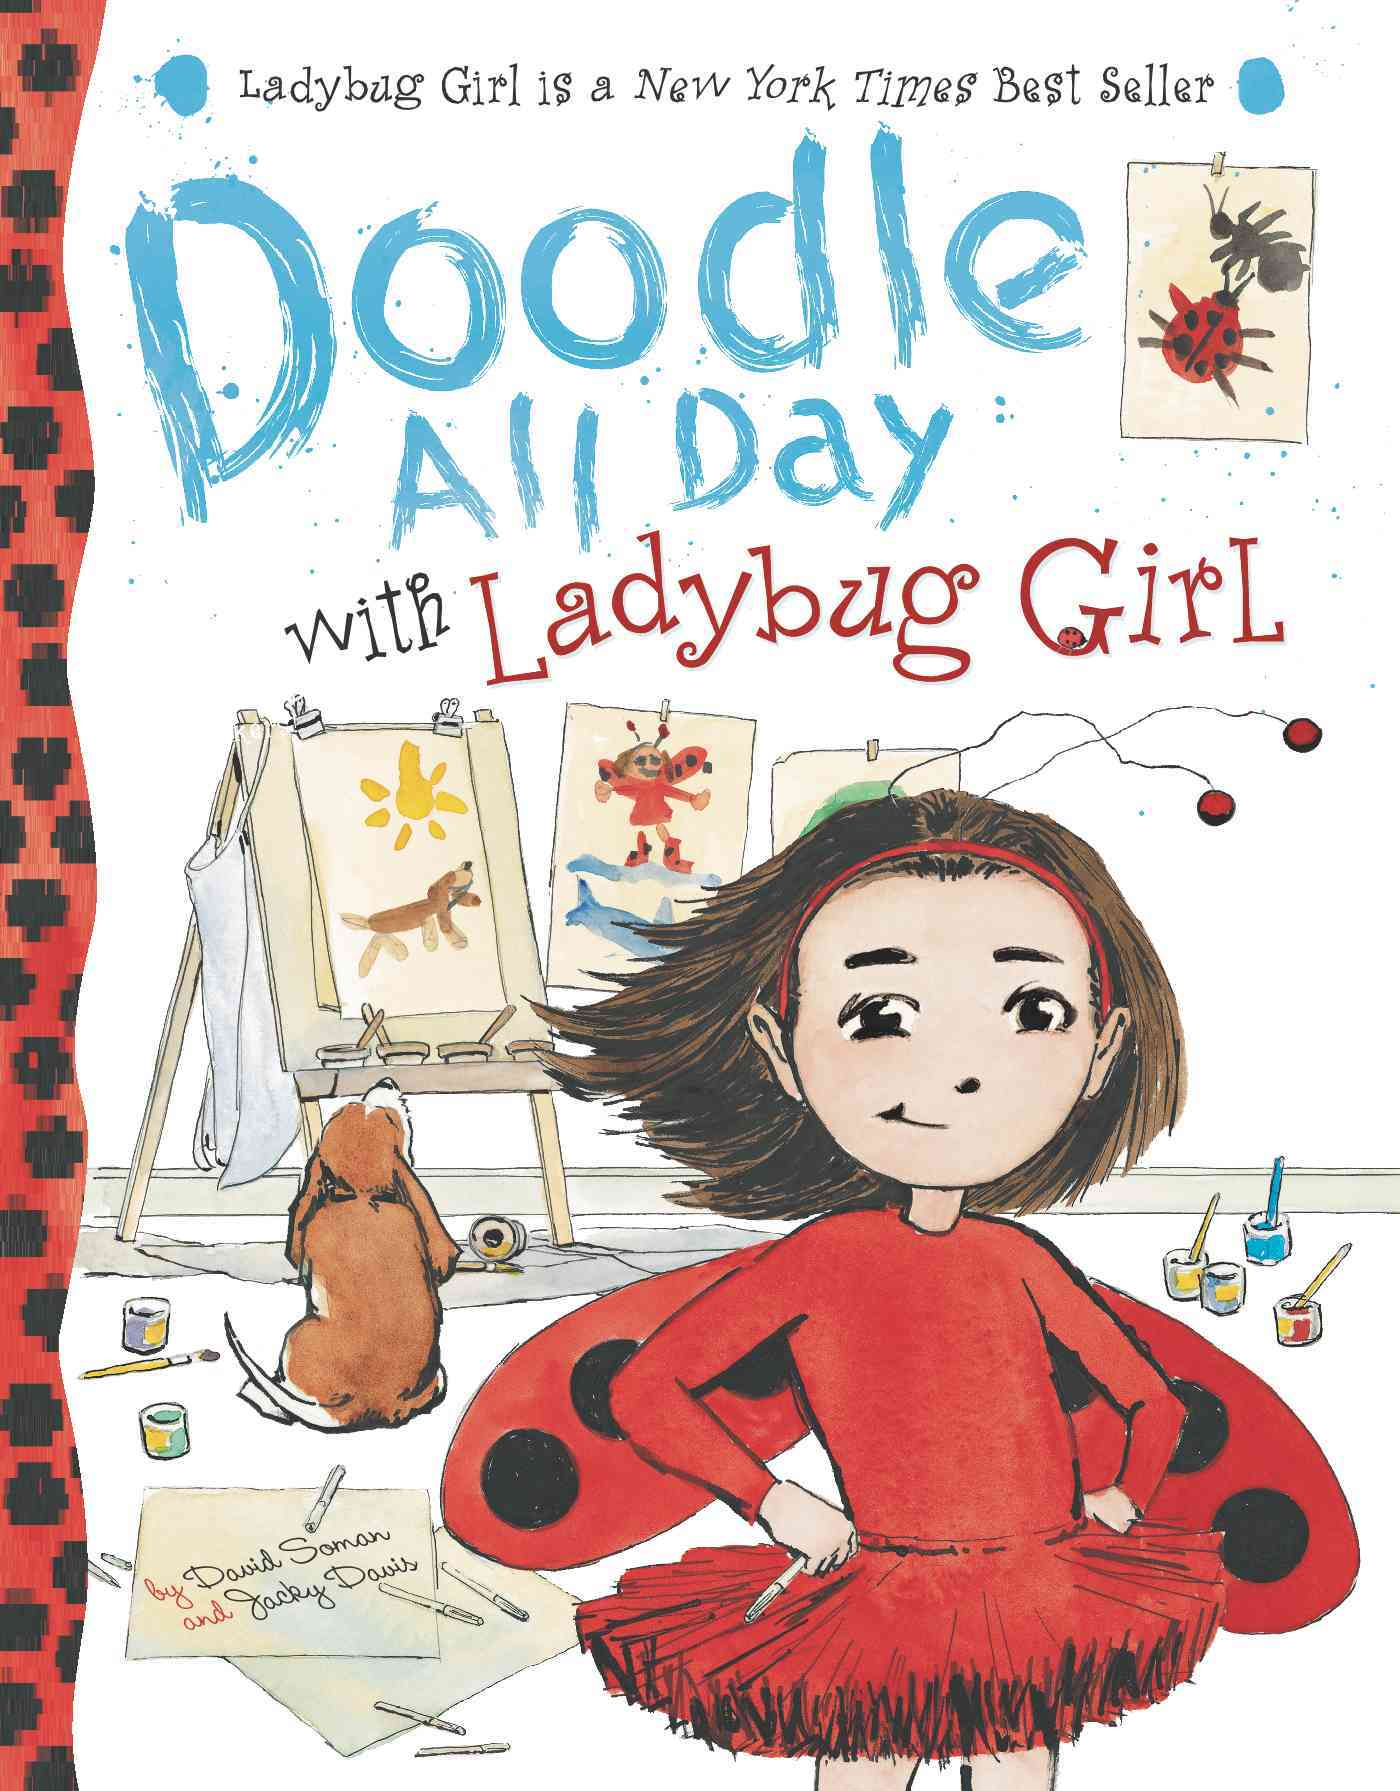 Doodle All Day With Ladybug Girl By Soman, David/ Davis, Jacky/ Soman, David (ILT)